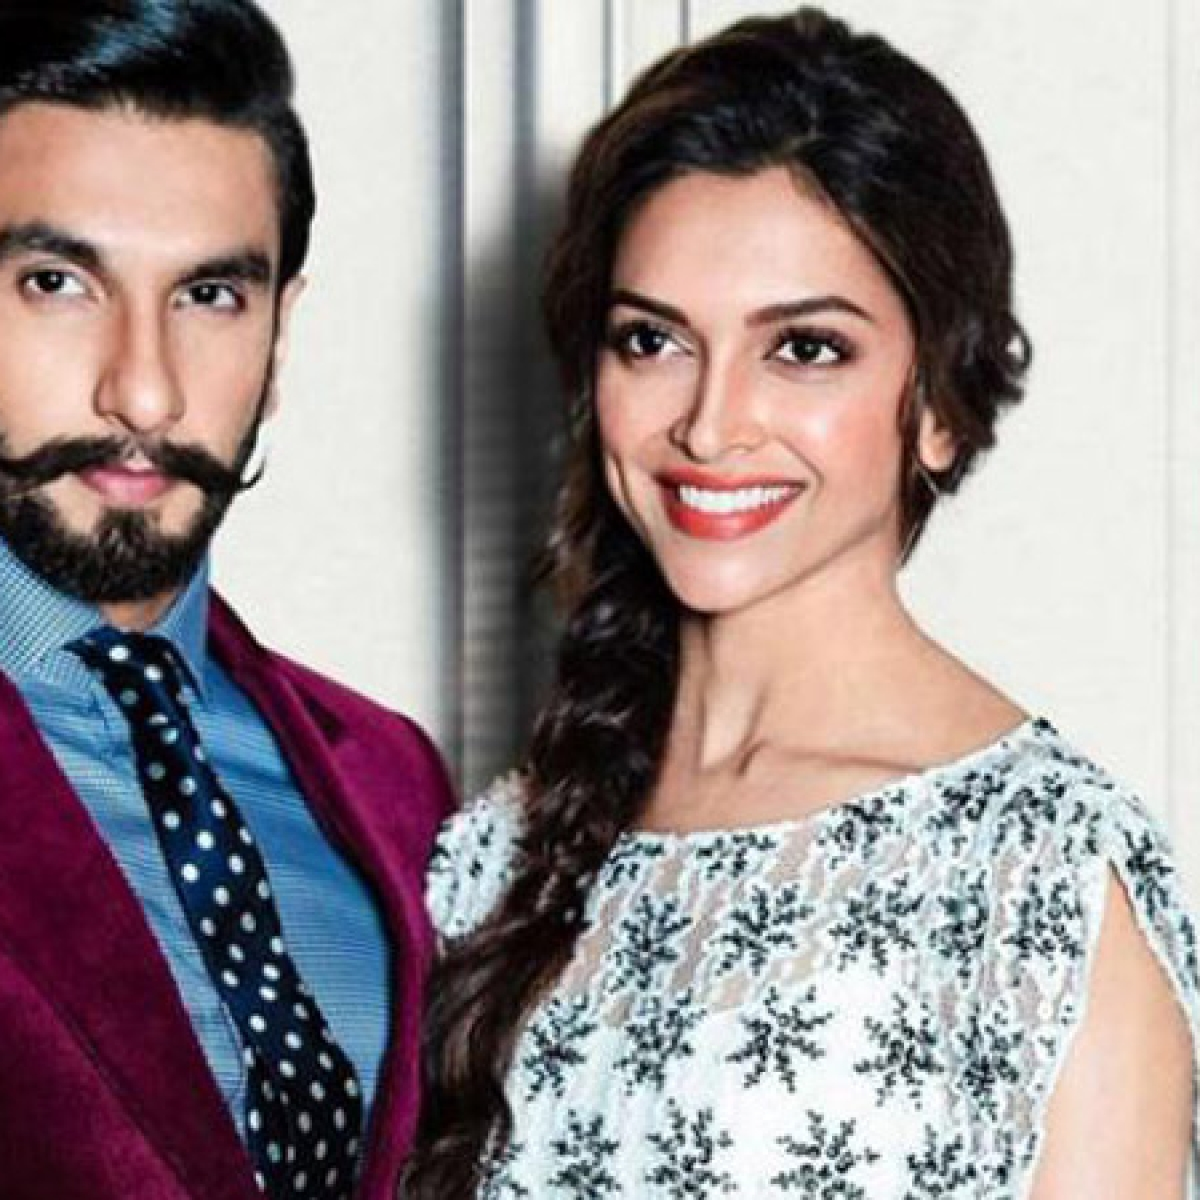 Kuch paise bach jayenge: Deepika Padukone gives Ranveer Singh tips on saving money